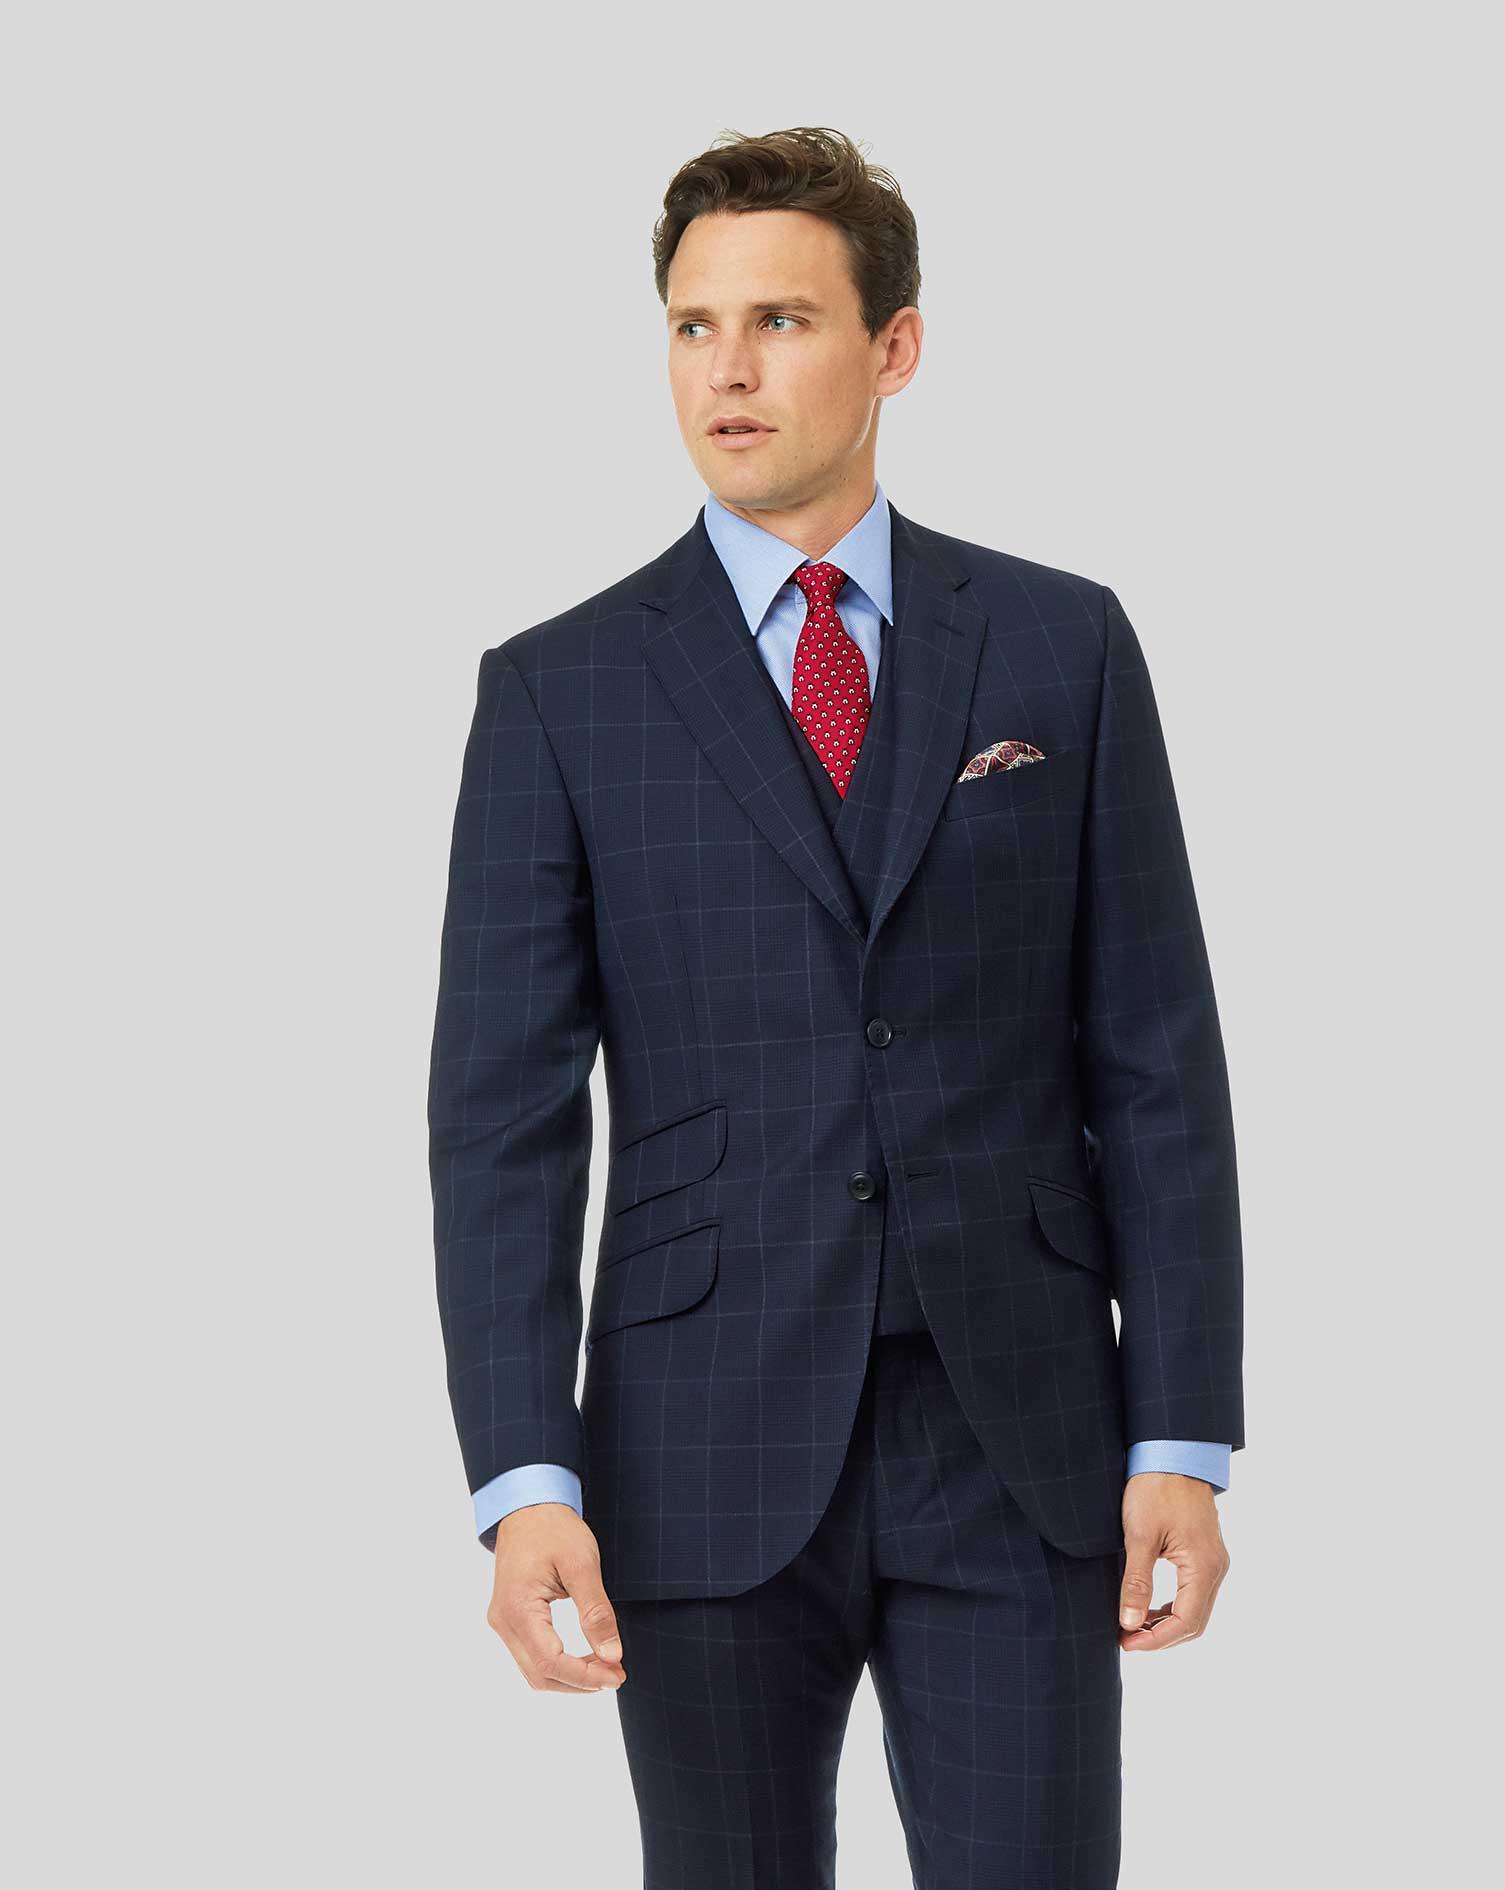 Wool British Luxury Check Suit Jacket - Navy